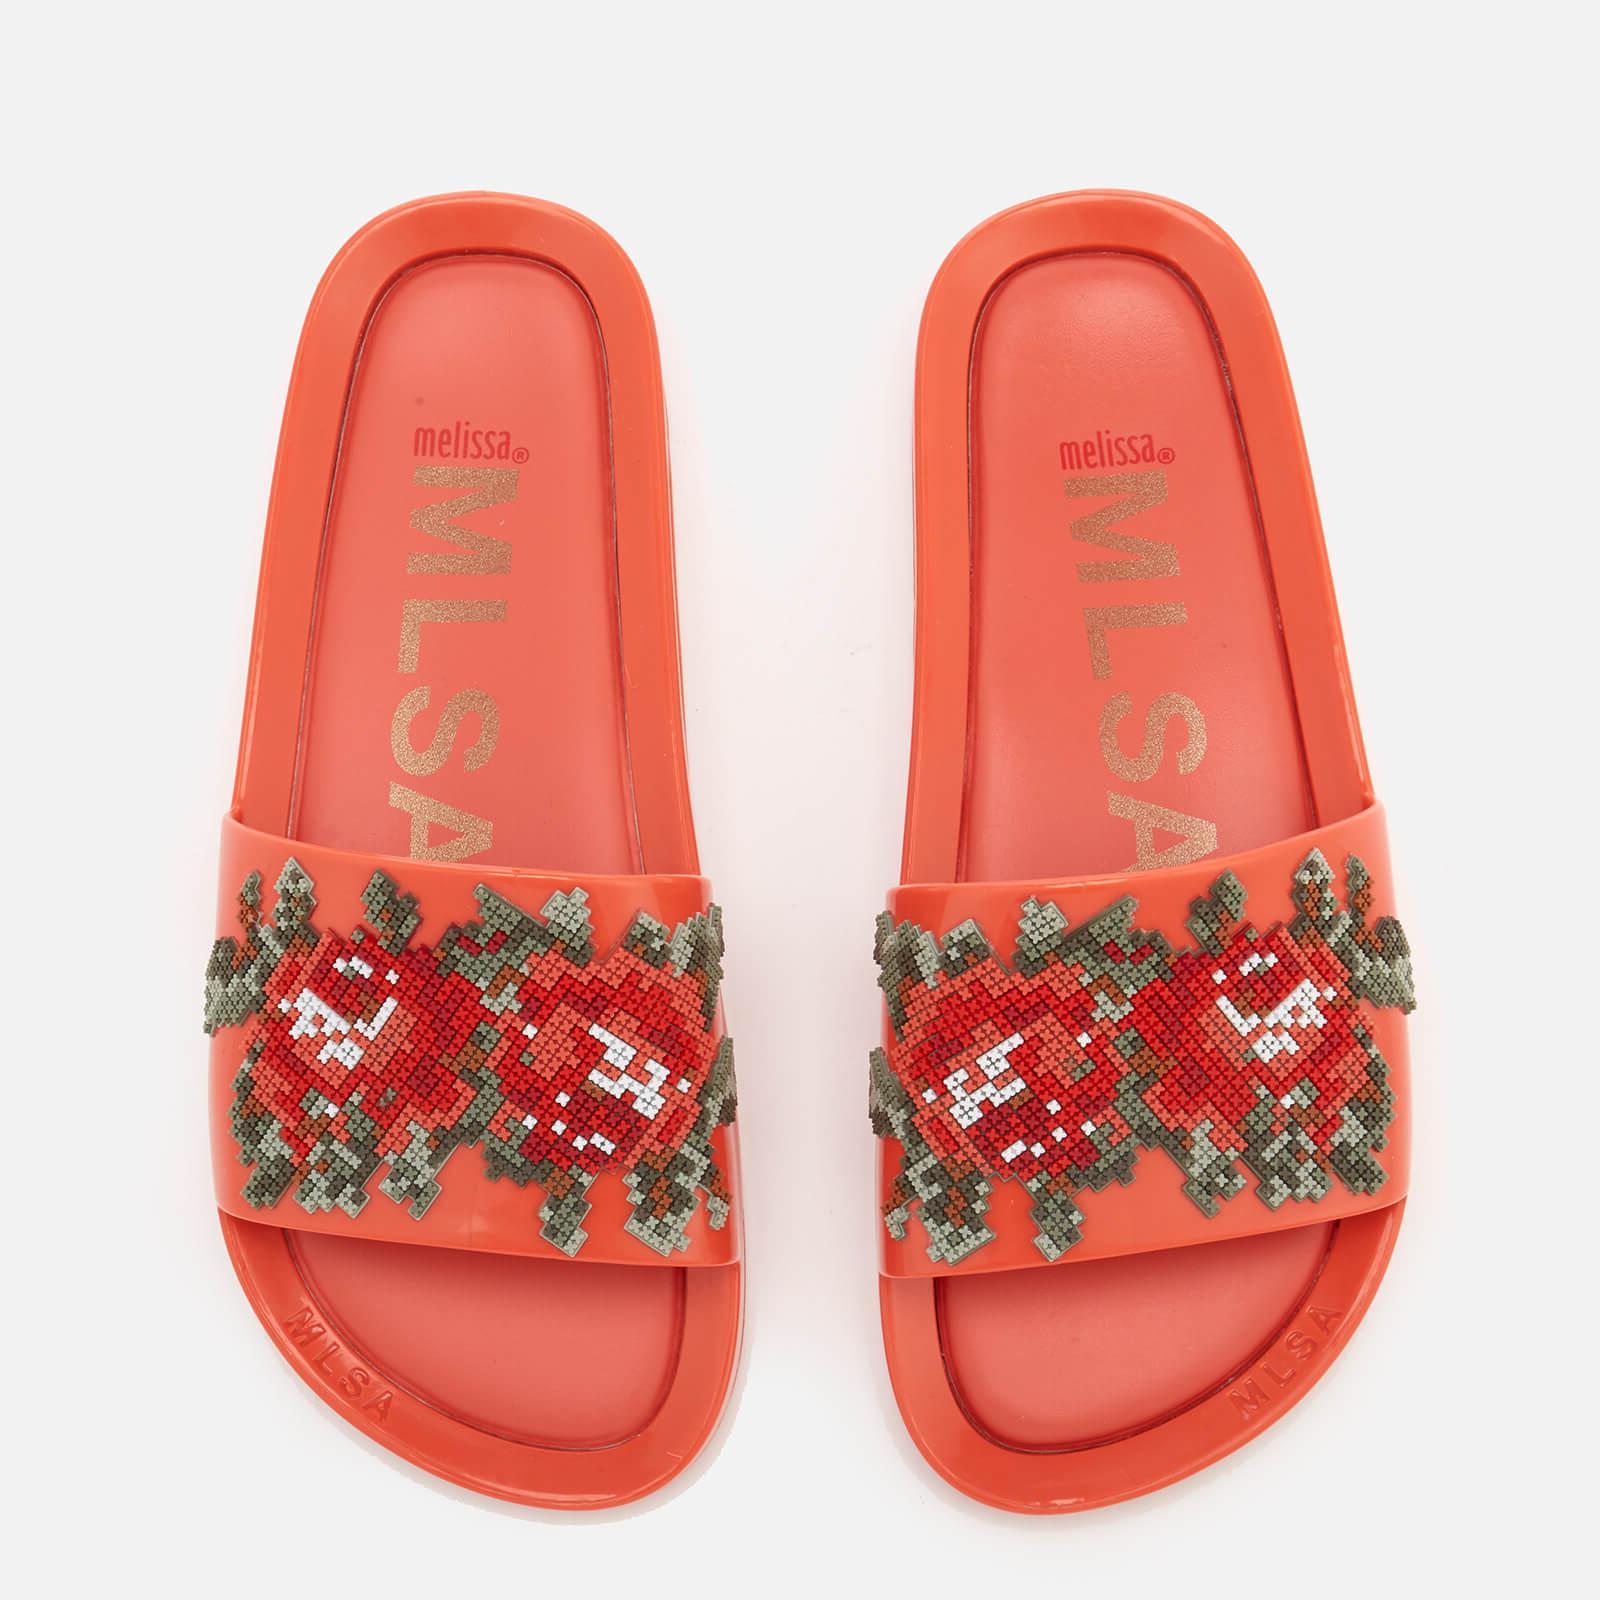 3f63622cb5fa8d Melissa - Orange Flower Pixel Beach Slide Sandals - Lyst. View fullscreen